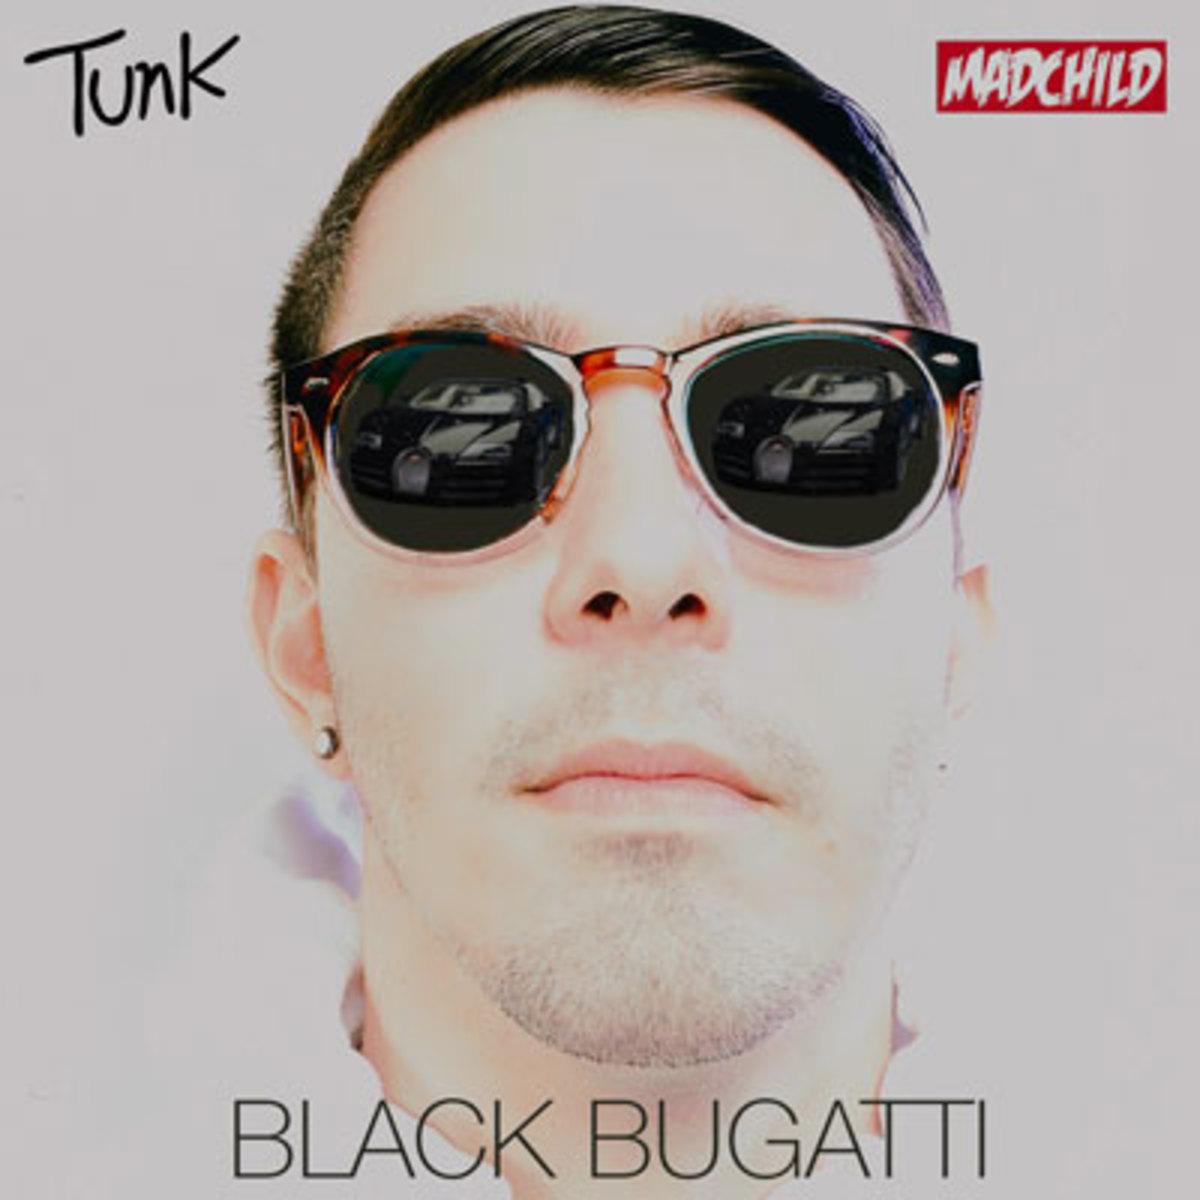 tunk-black-buggati.jpg